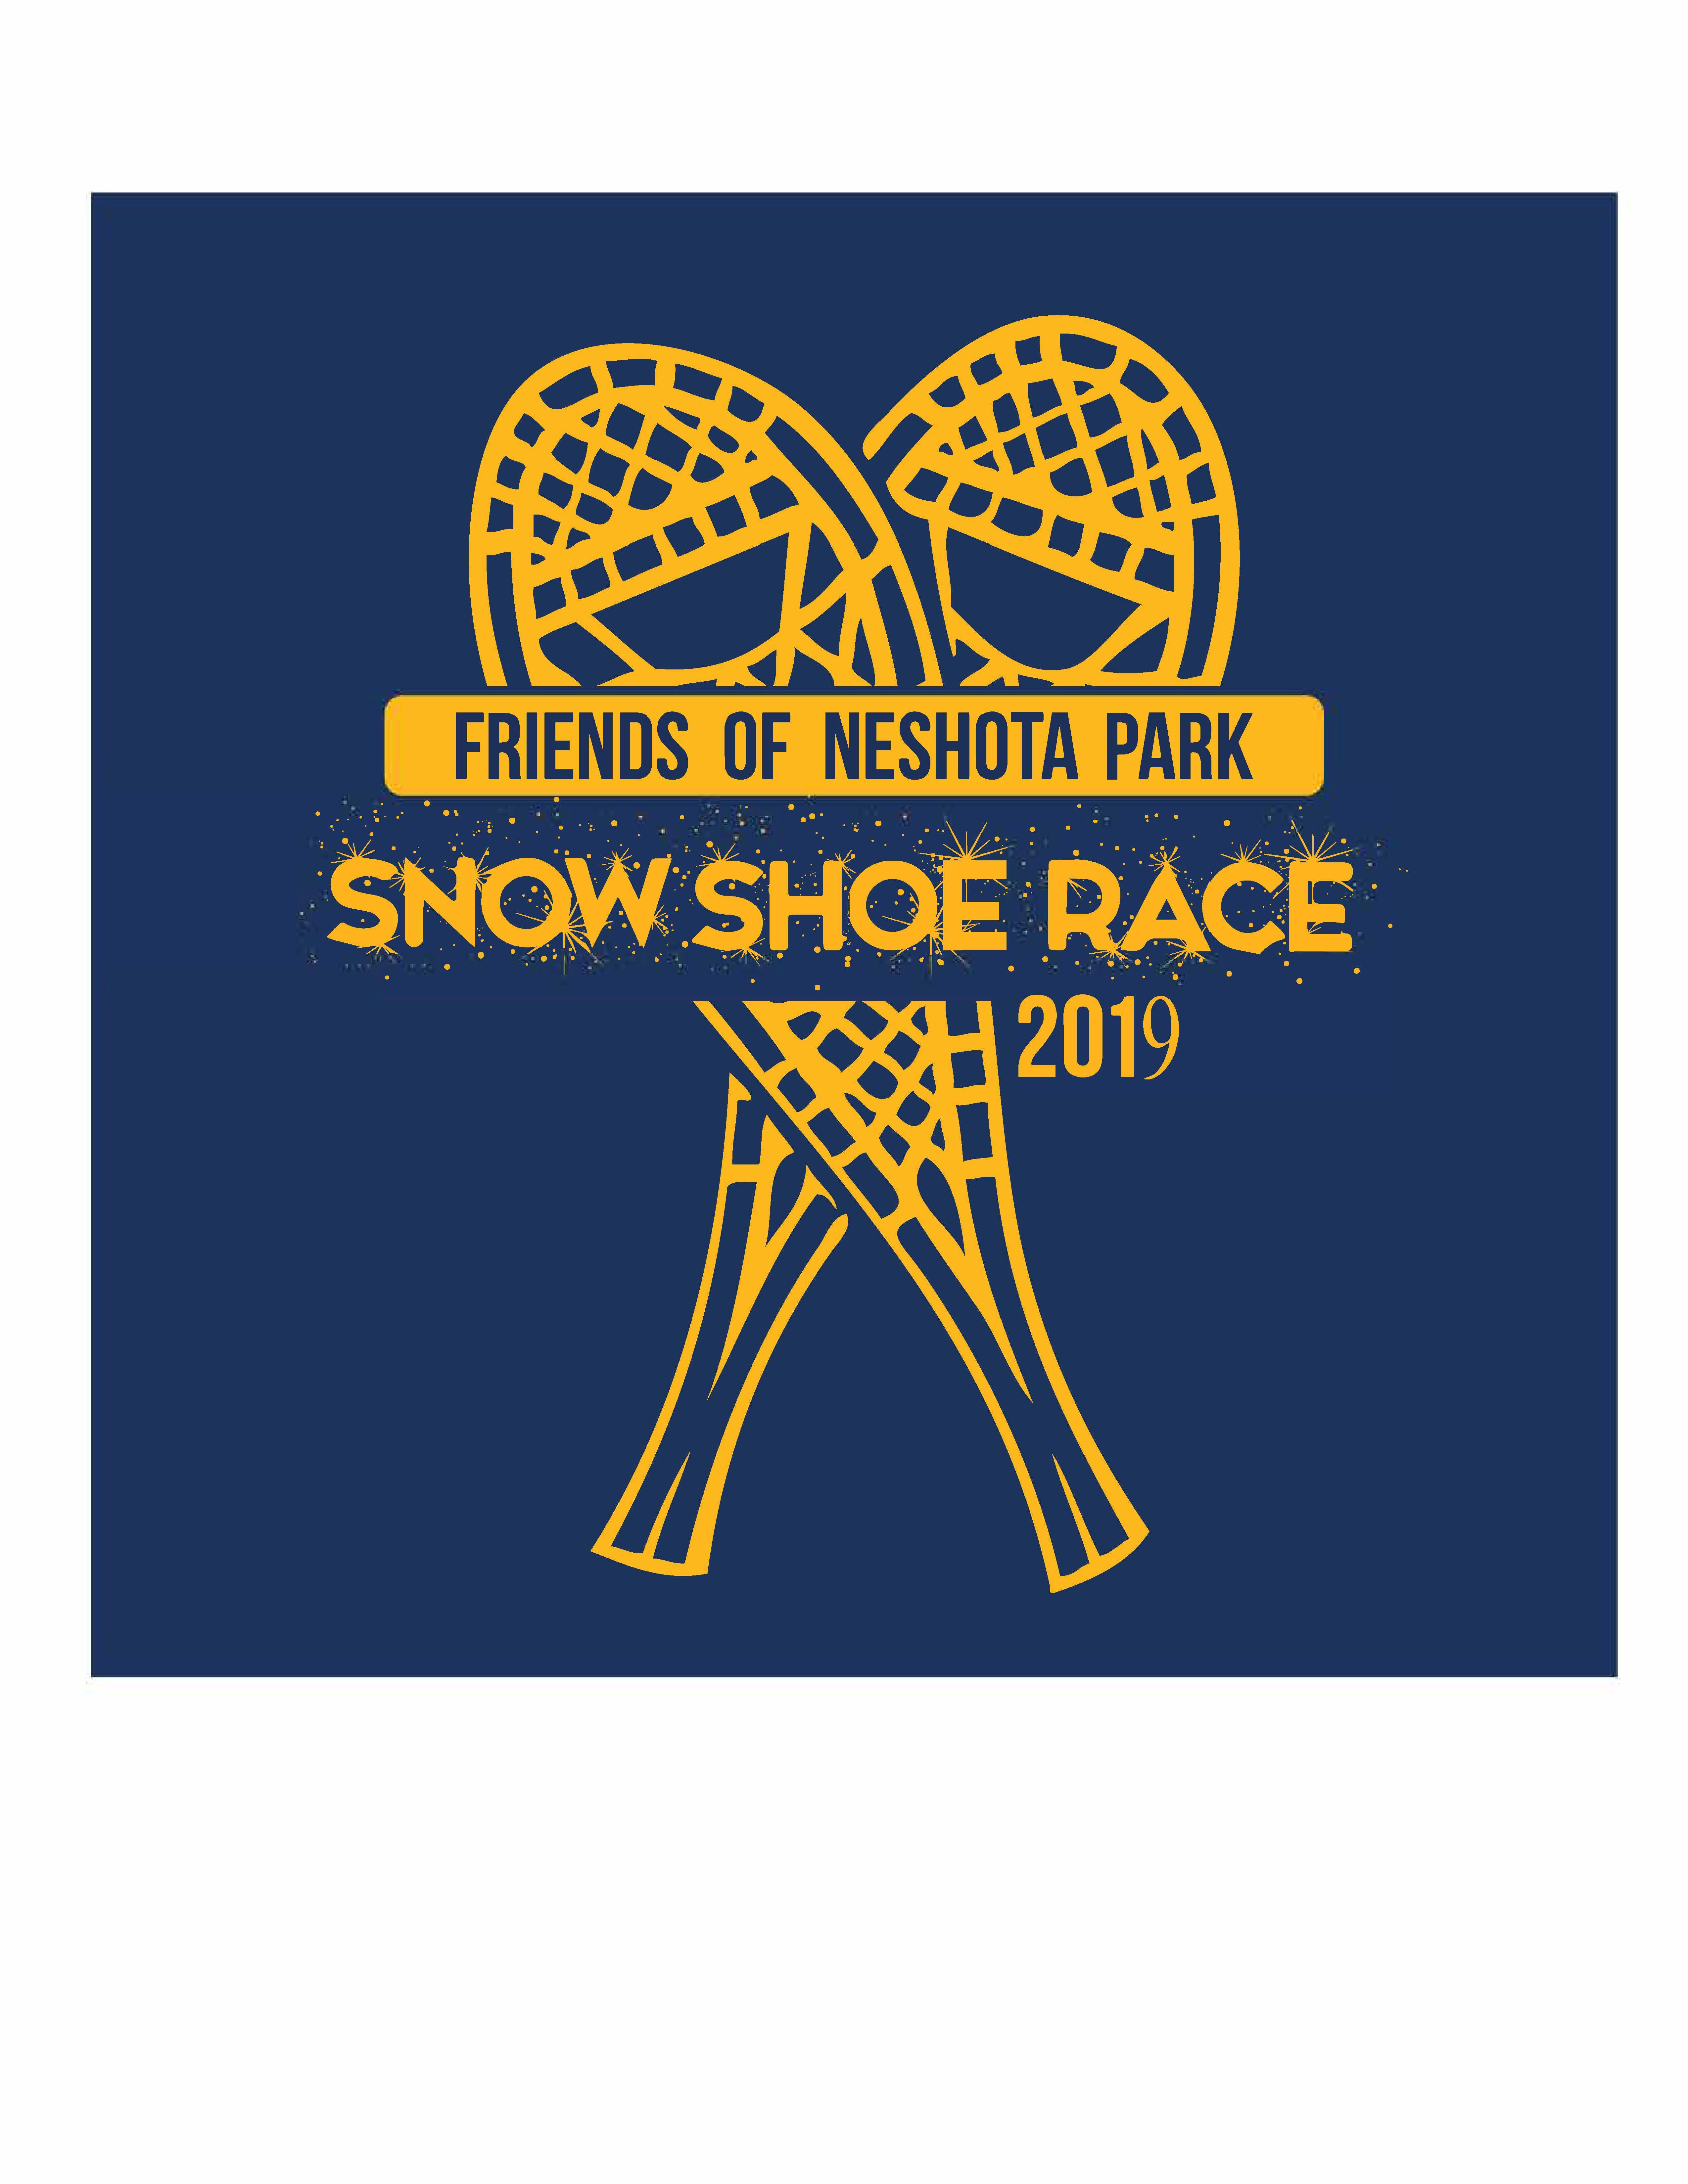 friends-of-neshota-park-snowshoe-race-sponsor